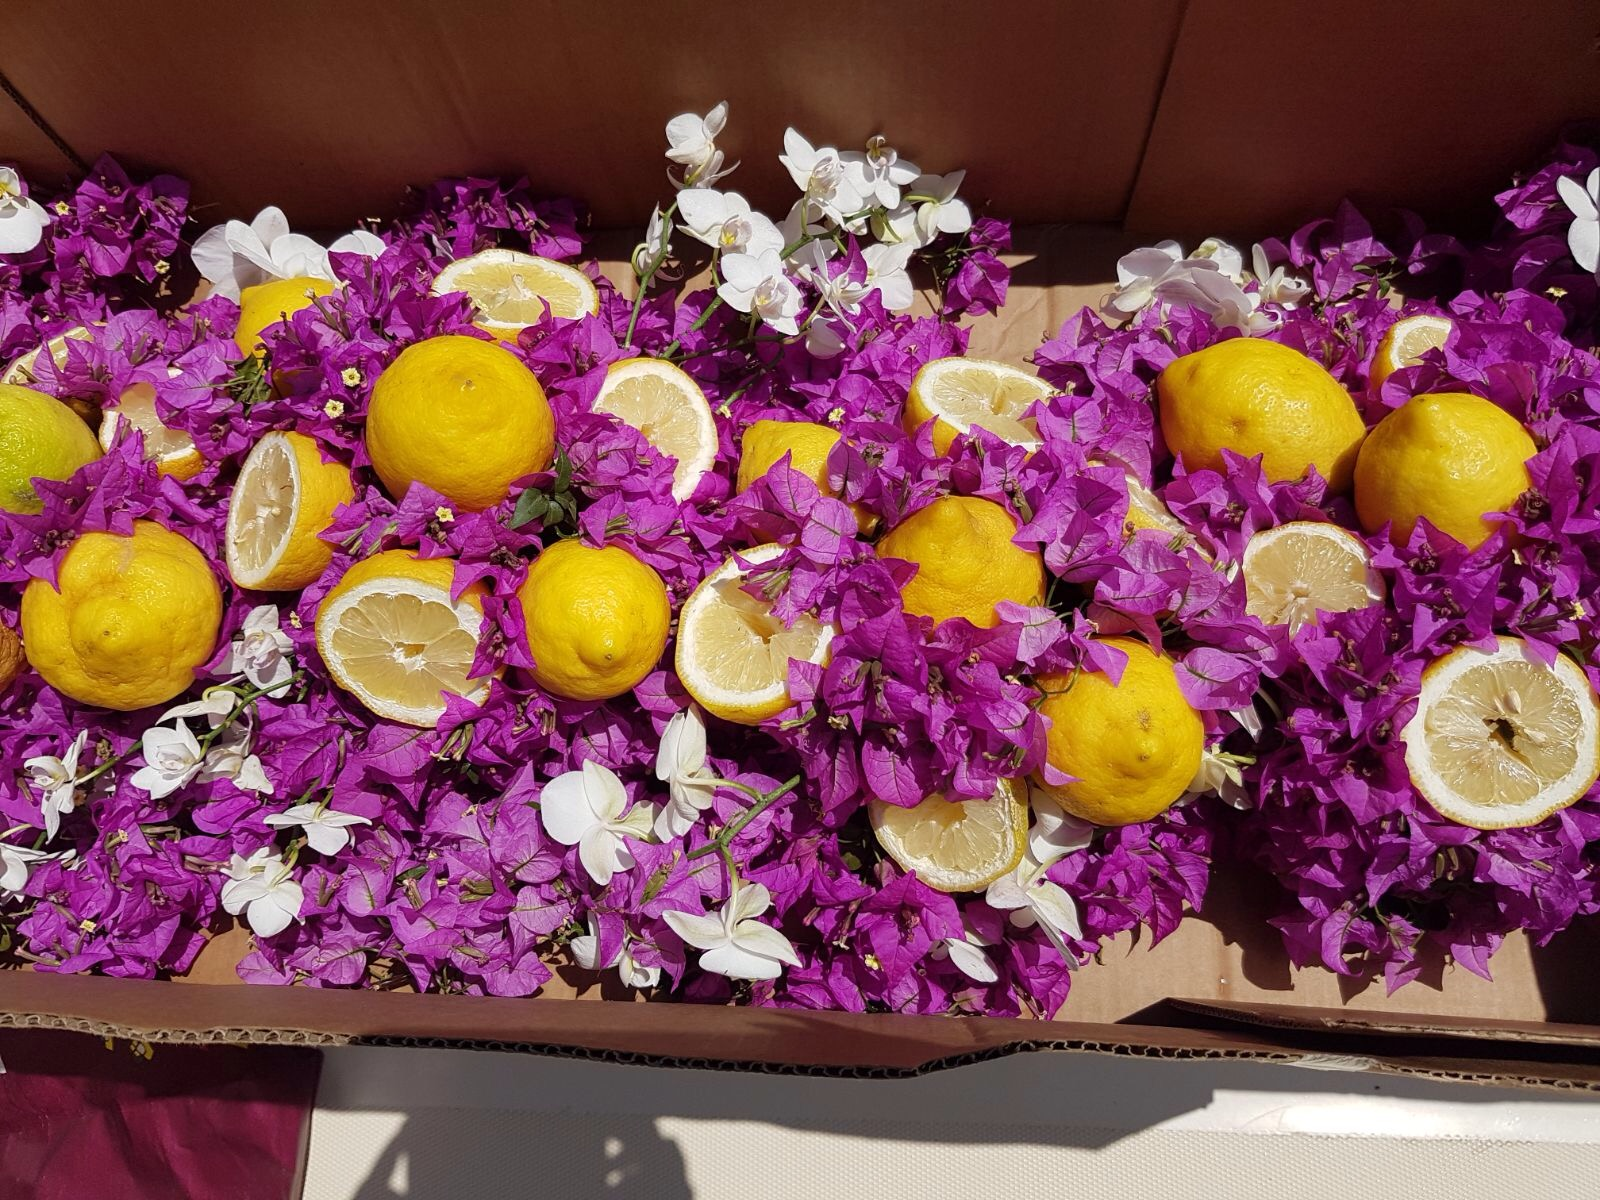 https://www.weddingamalfi.com/wp-content/uploads/Nathalie-and-Benjamin-wedding-day-in-Positano-5.jpg